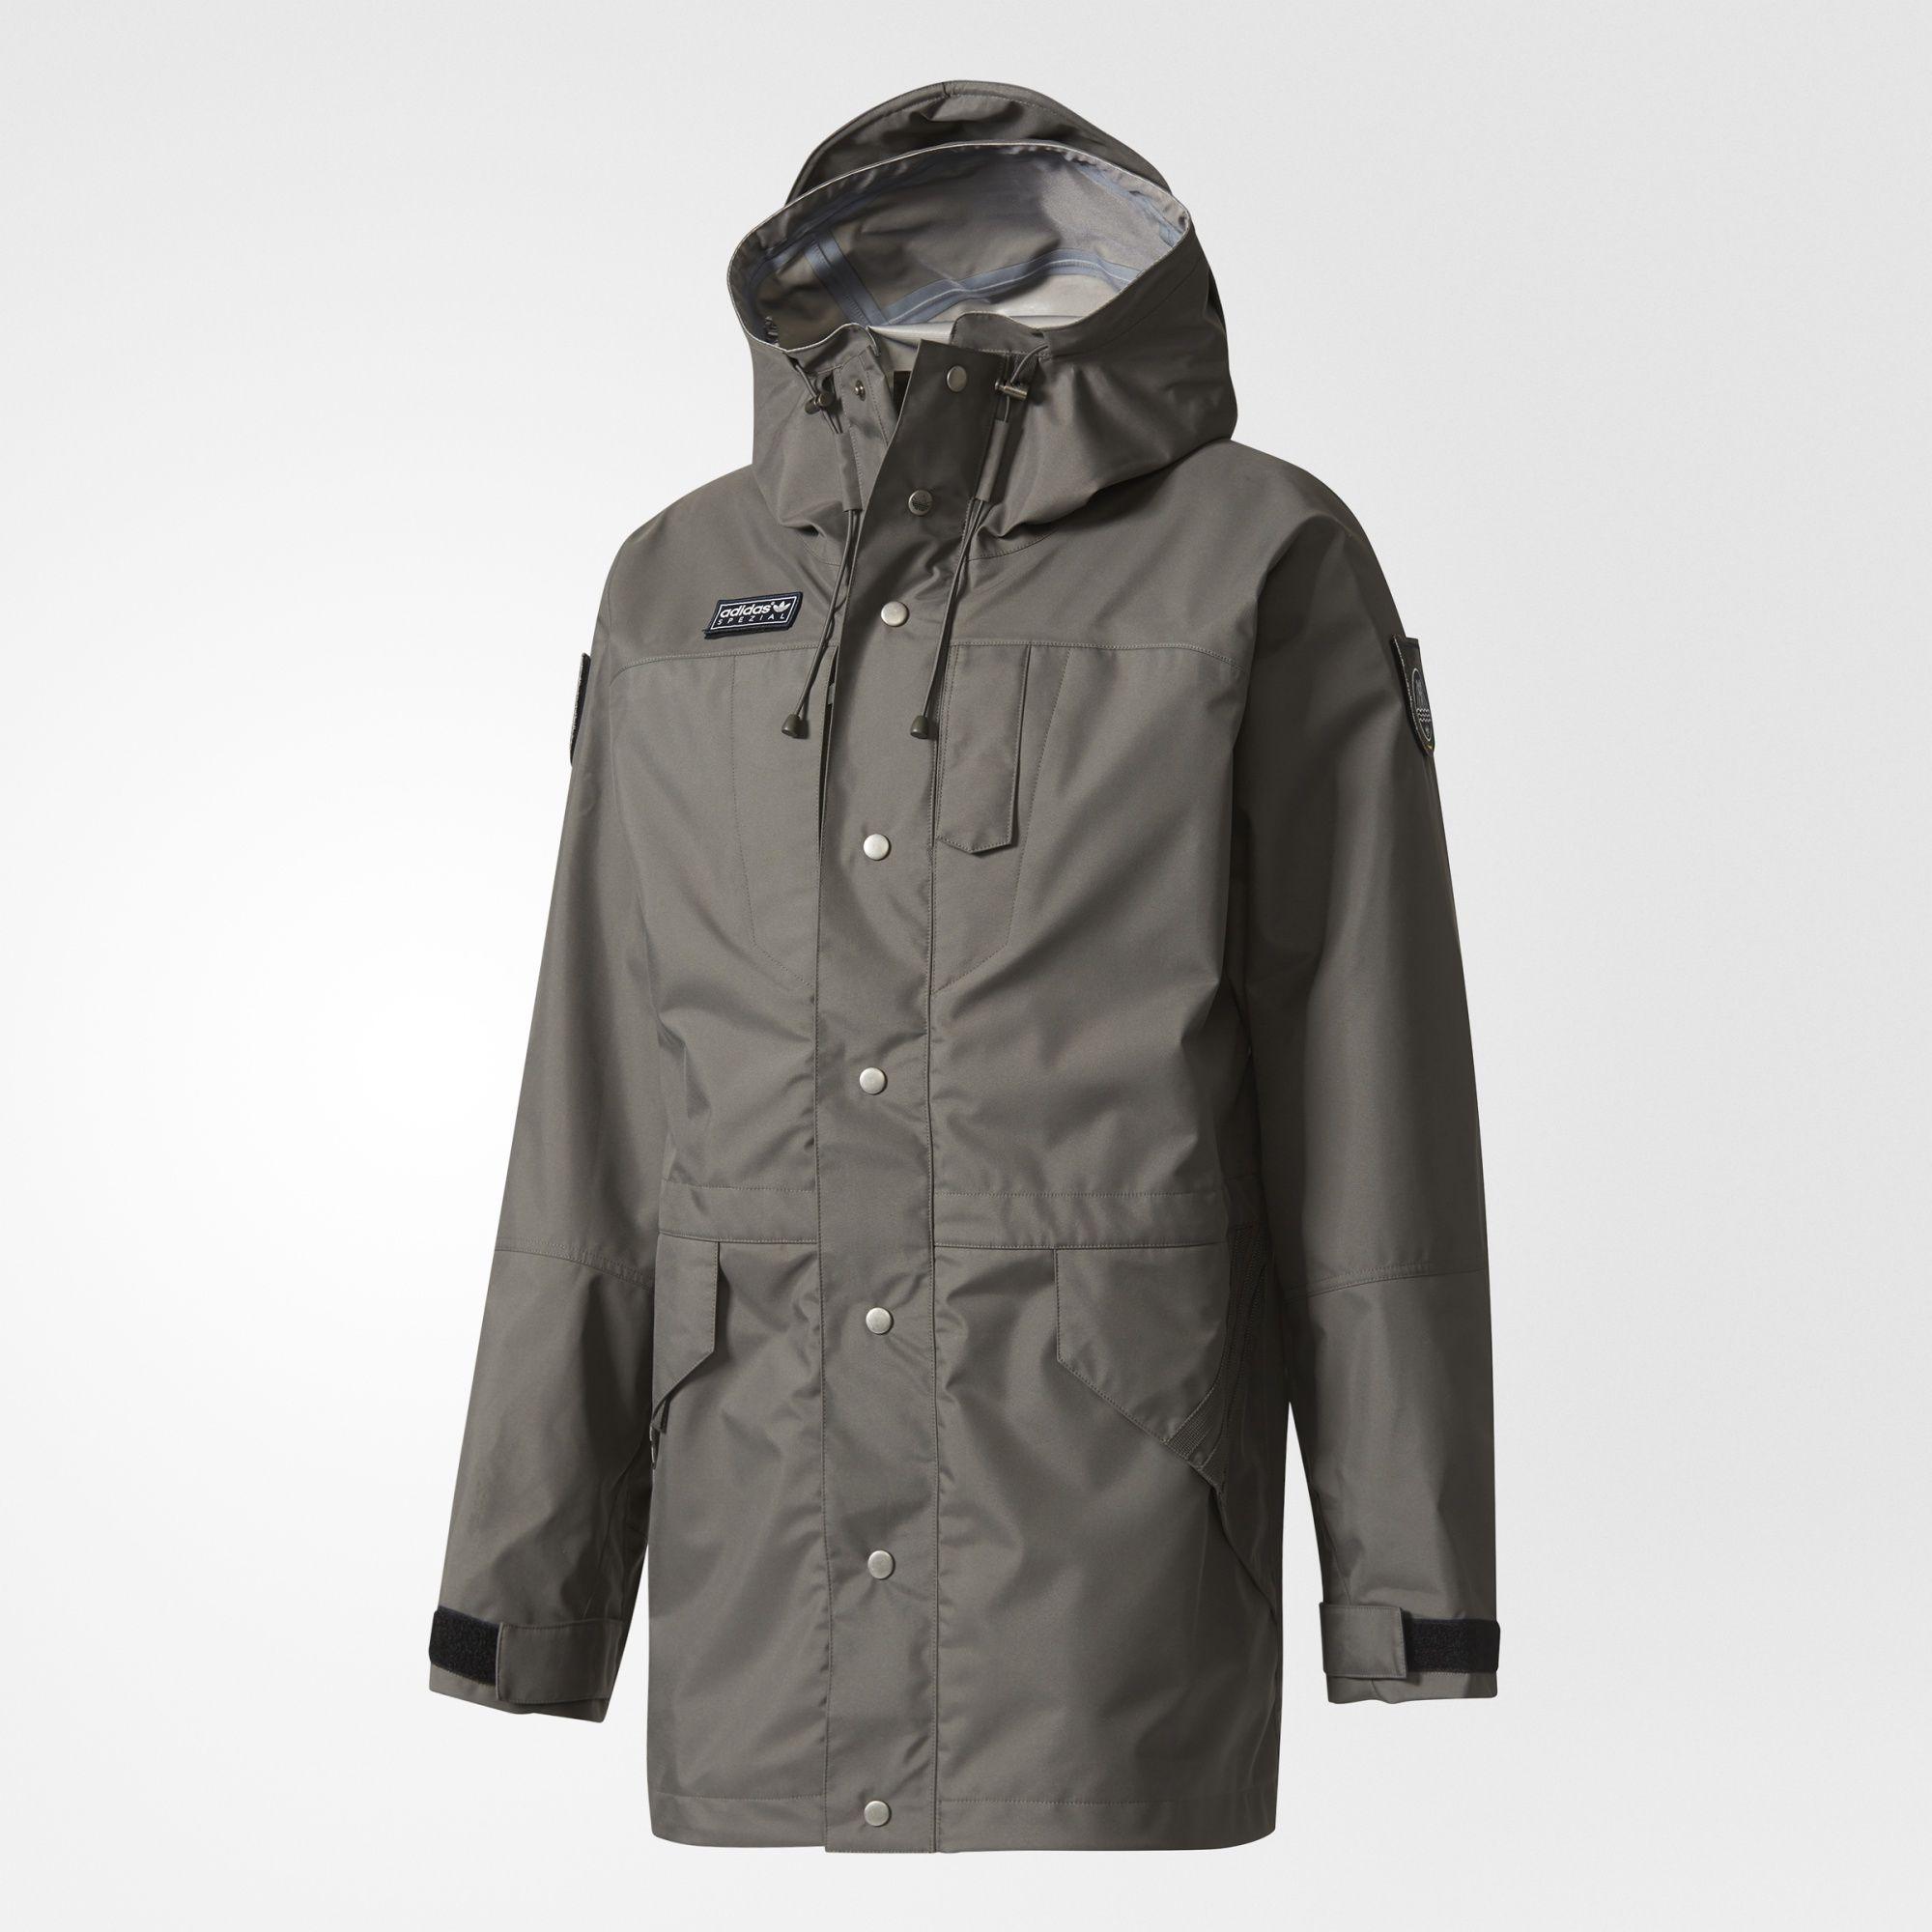 Adidas spezial, Mens jackets, Anorak